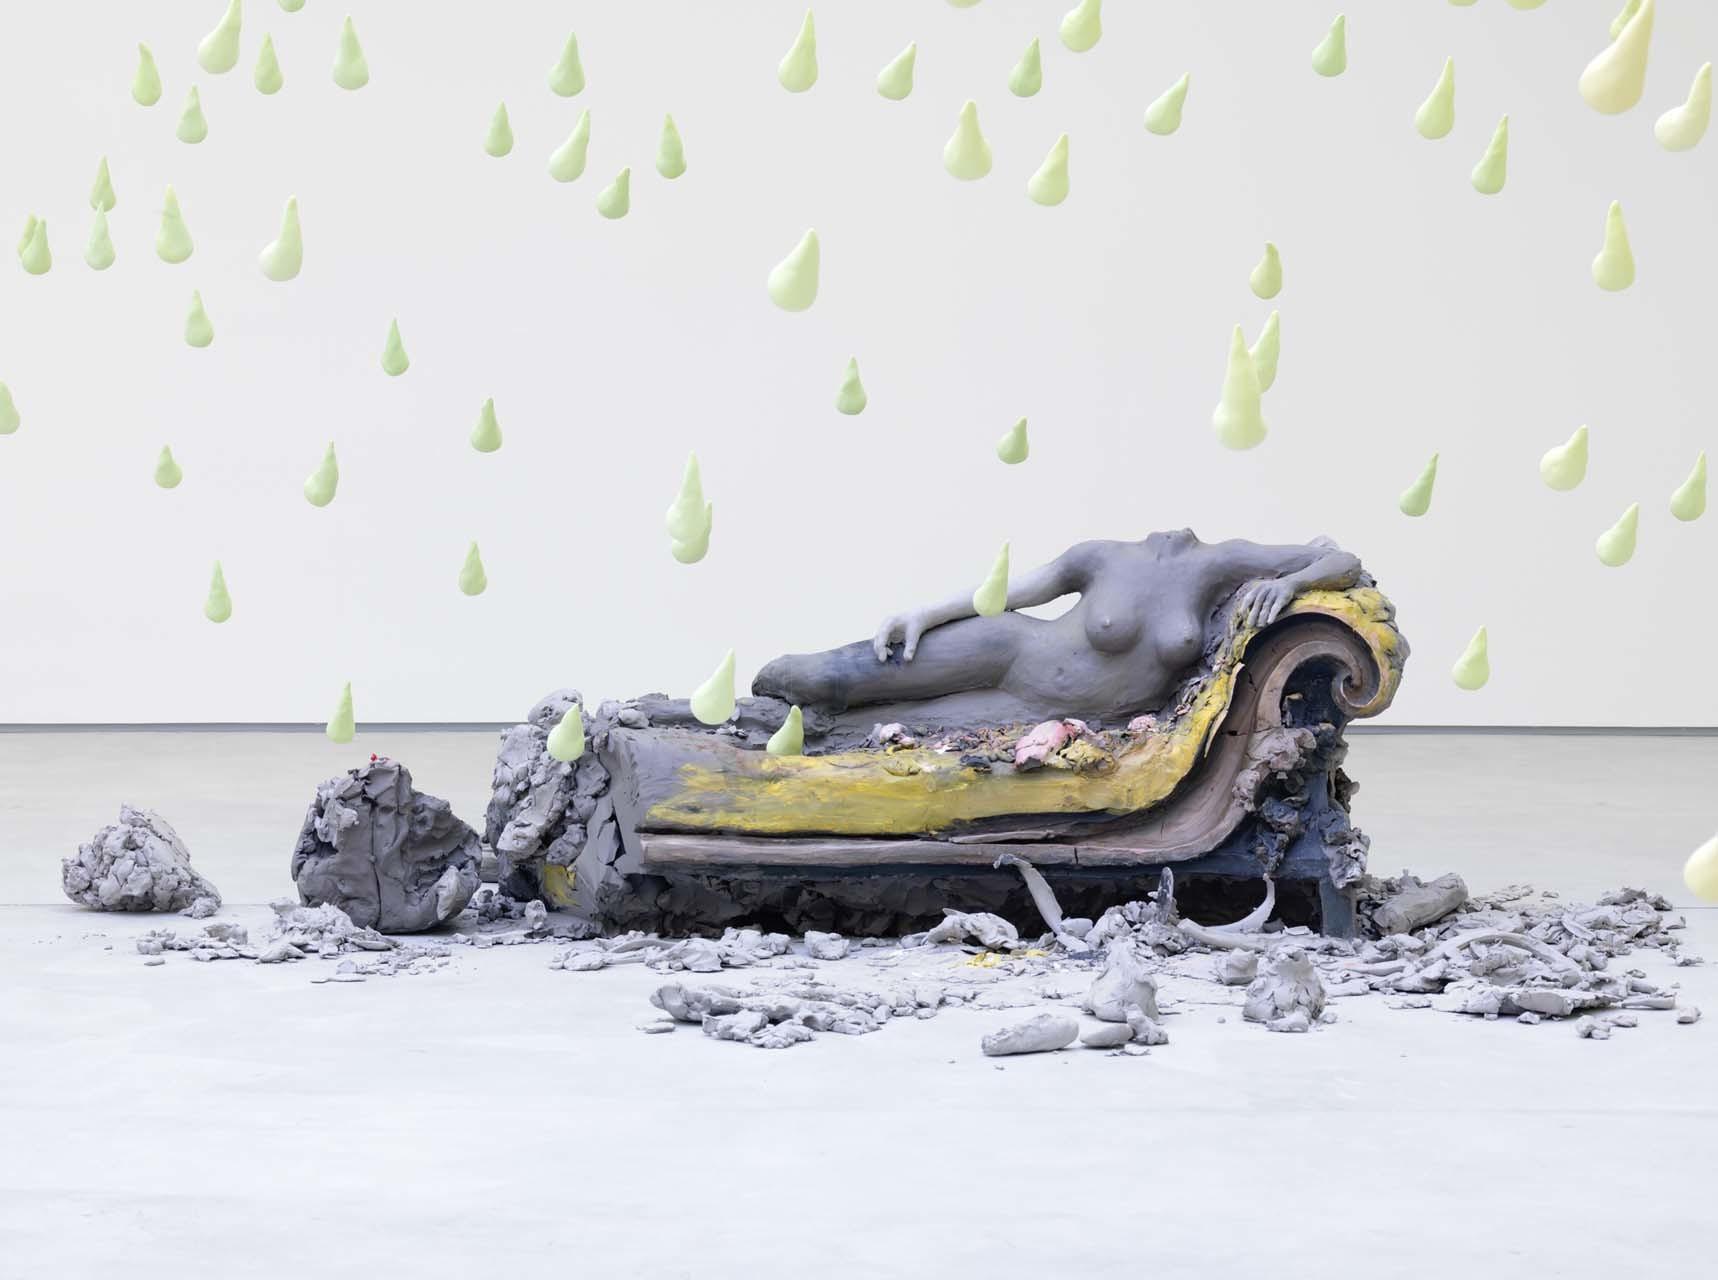 "<div class=""artwork_caption""><p>Installation view, 2013<br>Photography: Mats Nordman</p></div>"